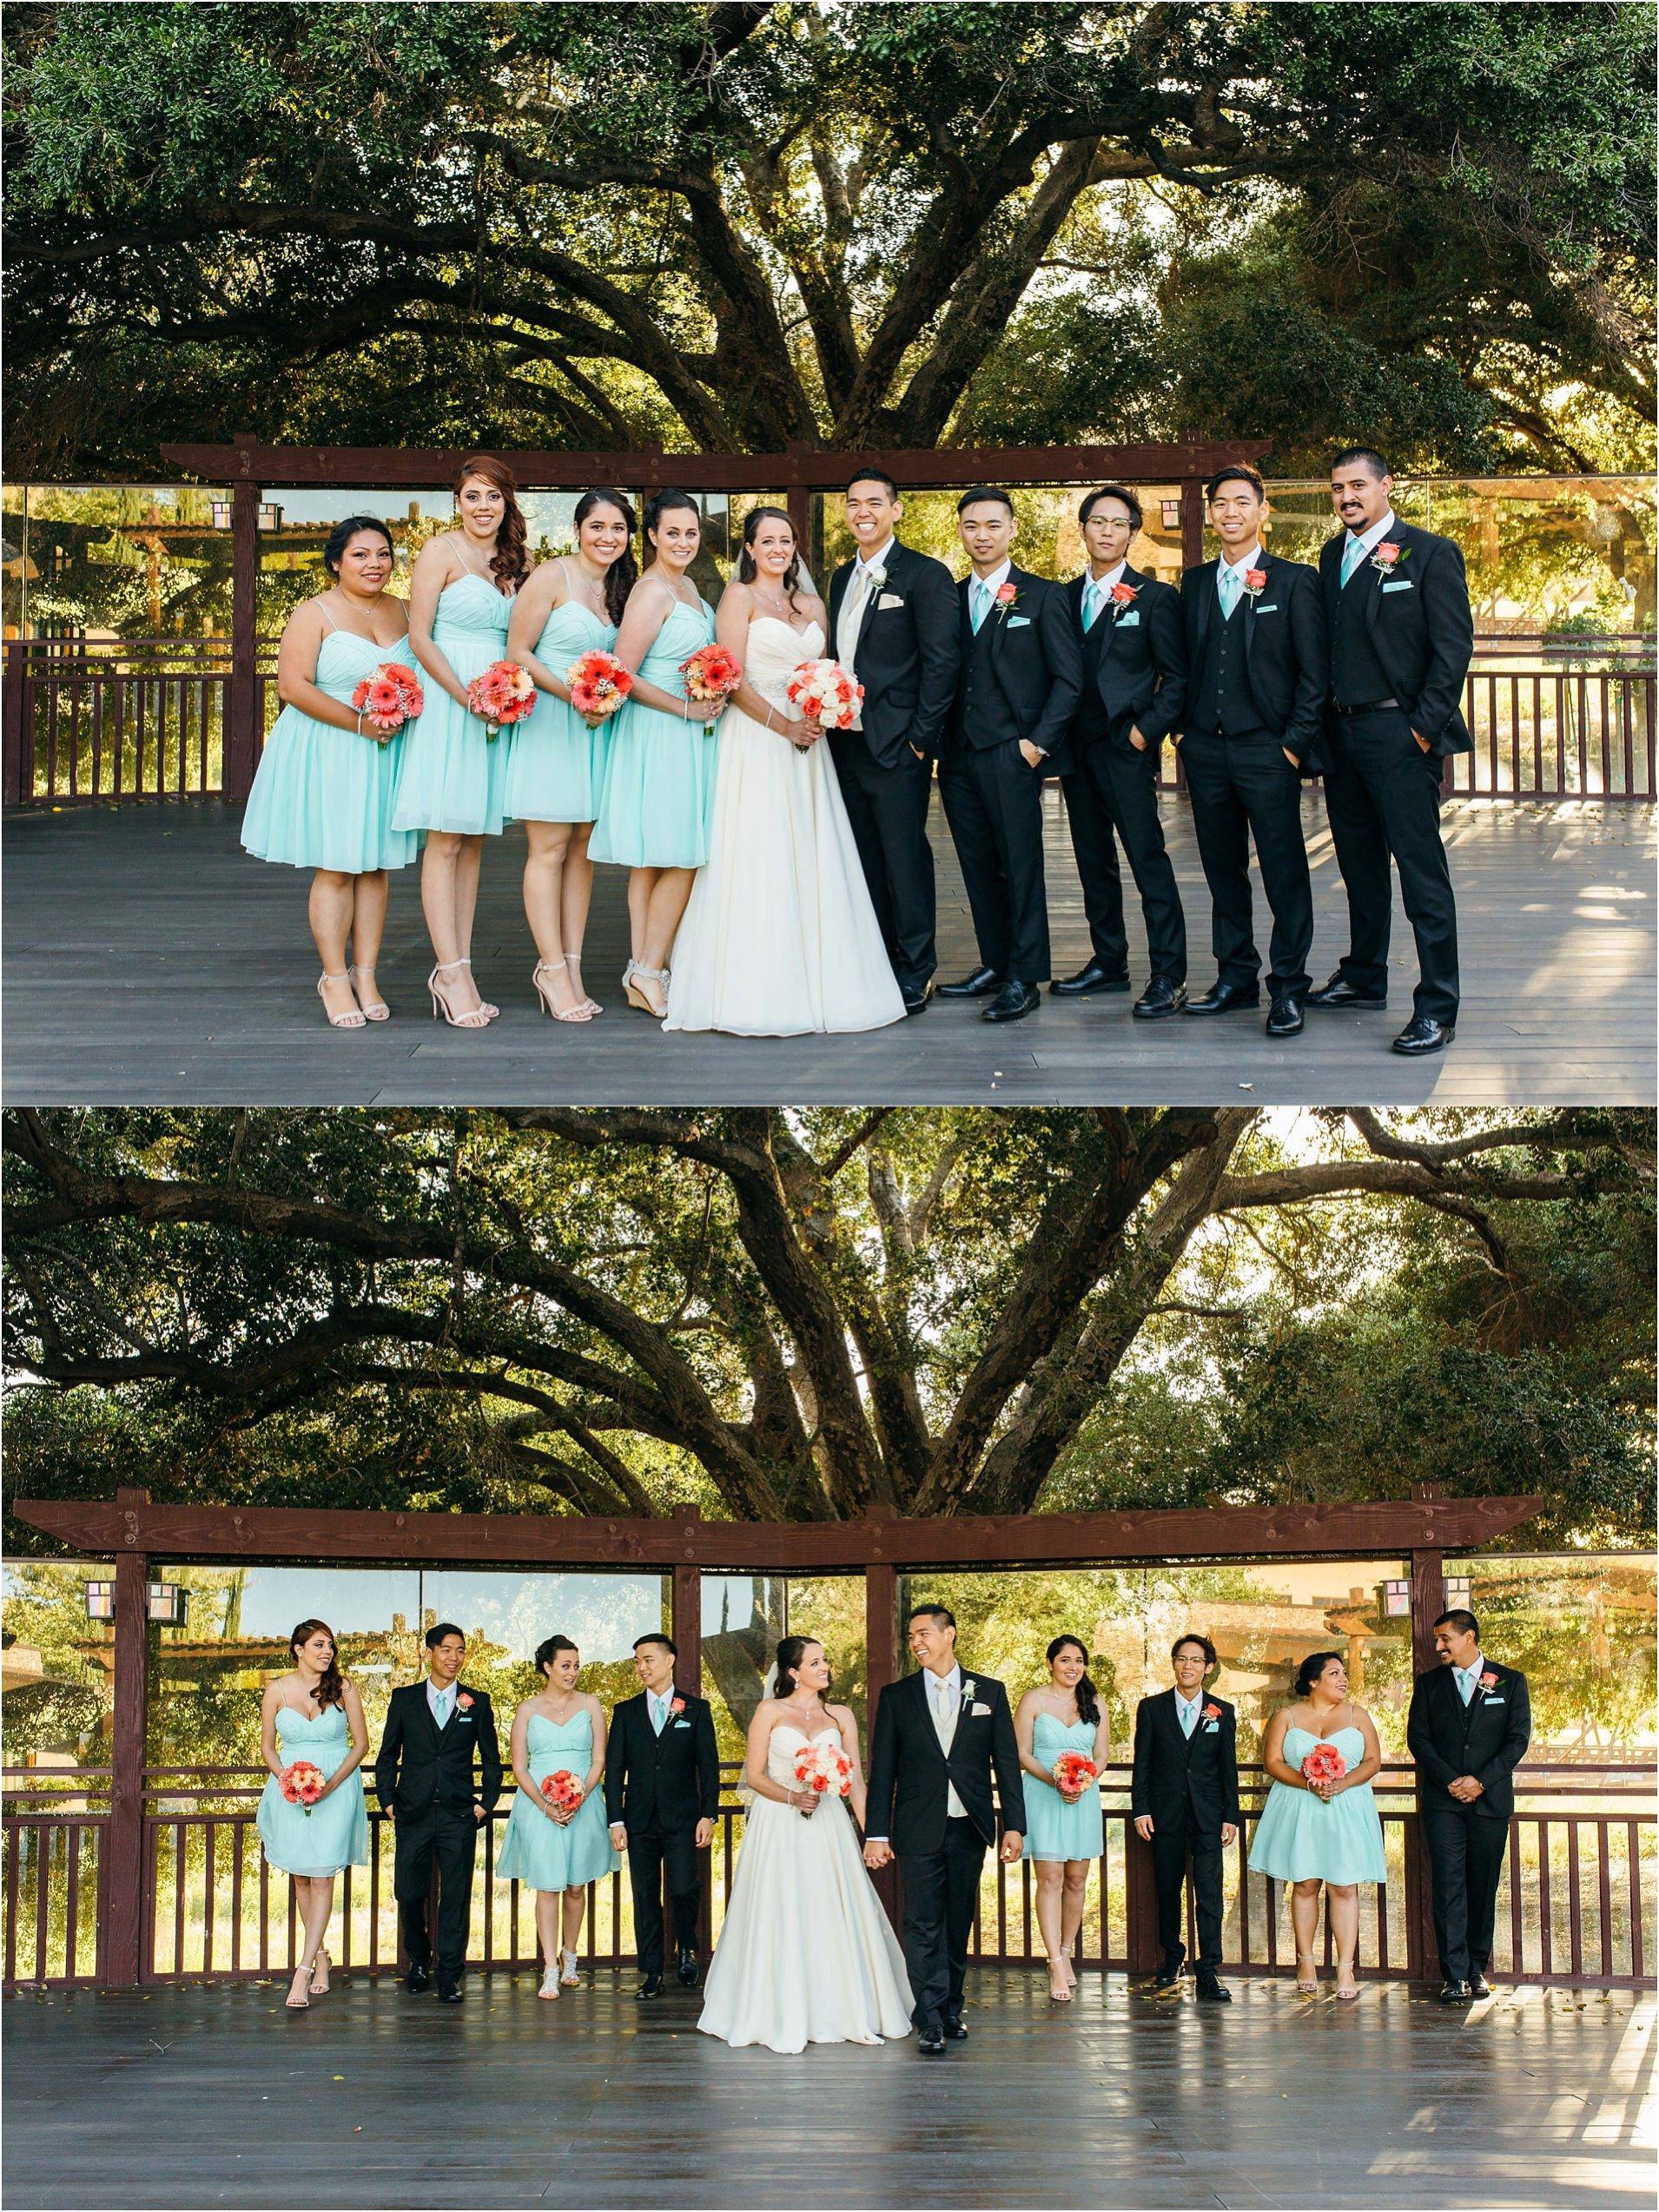 bridal party photos in temecula, ca